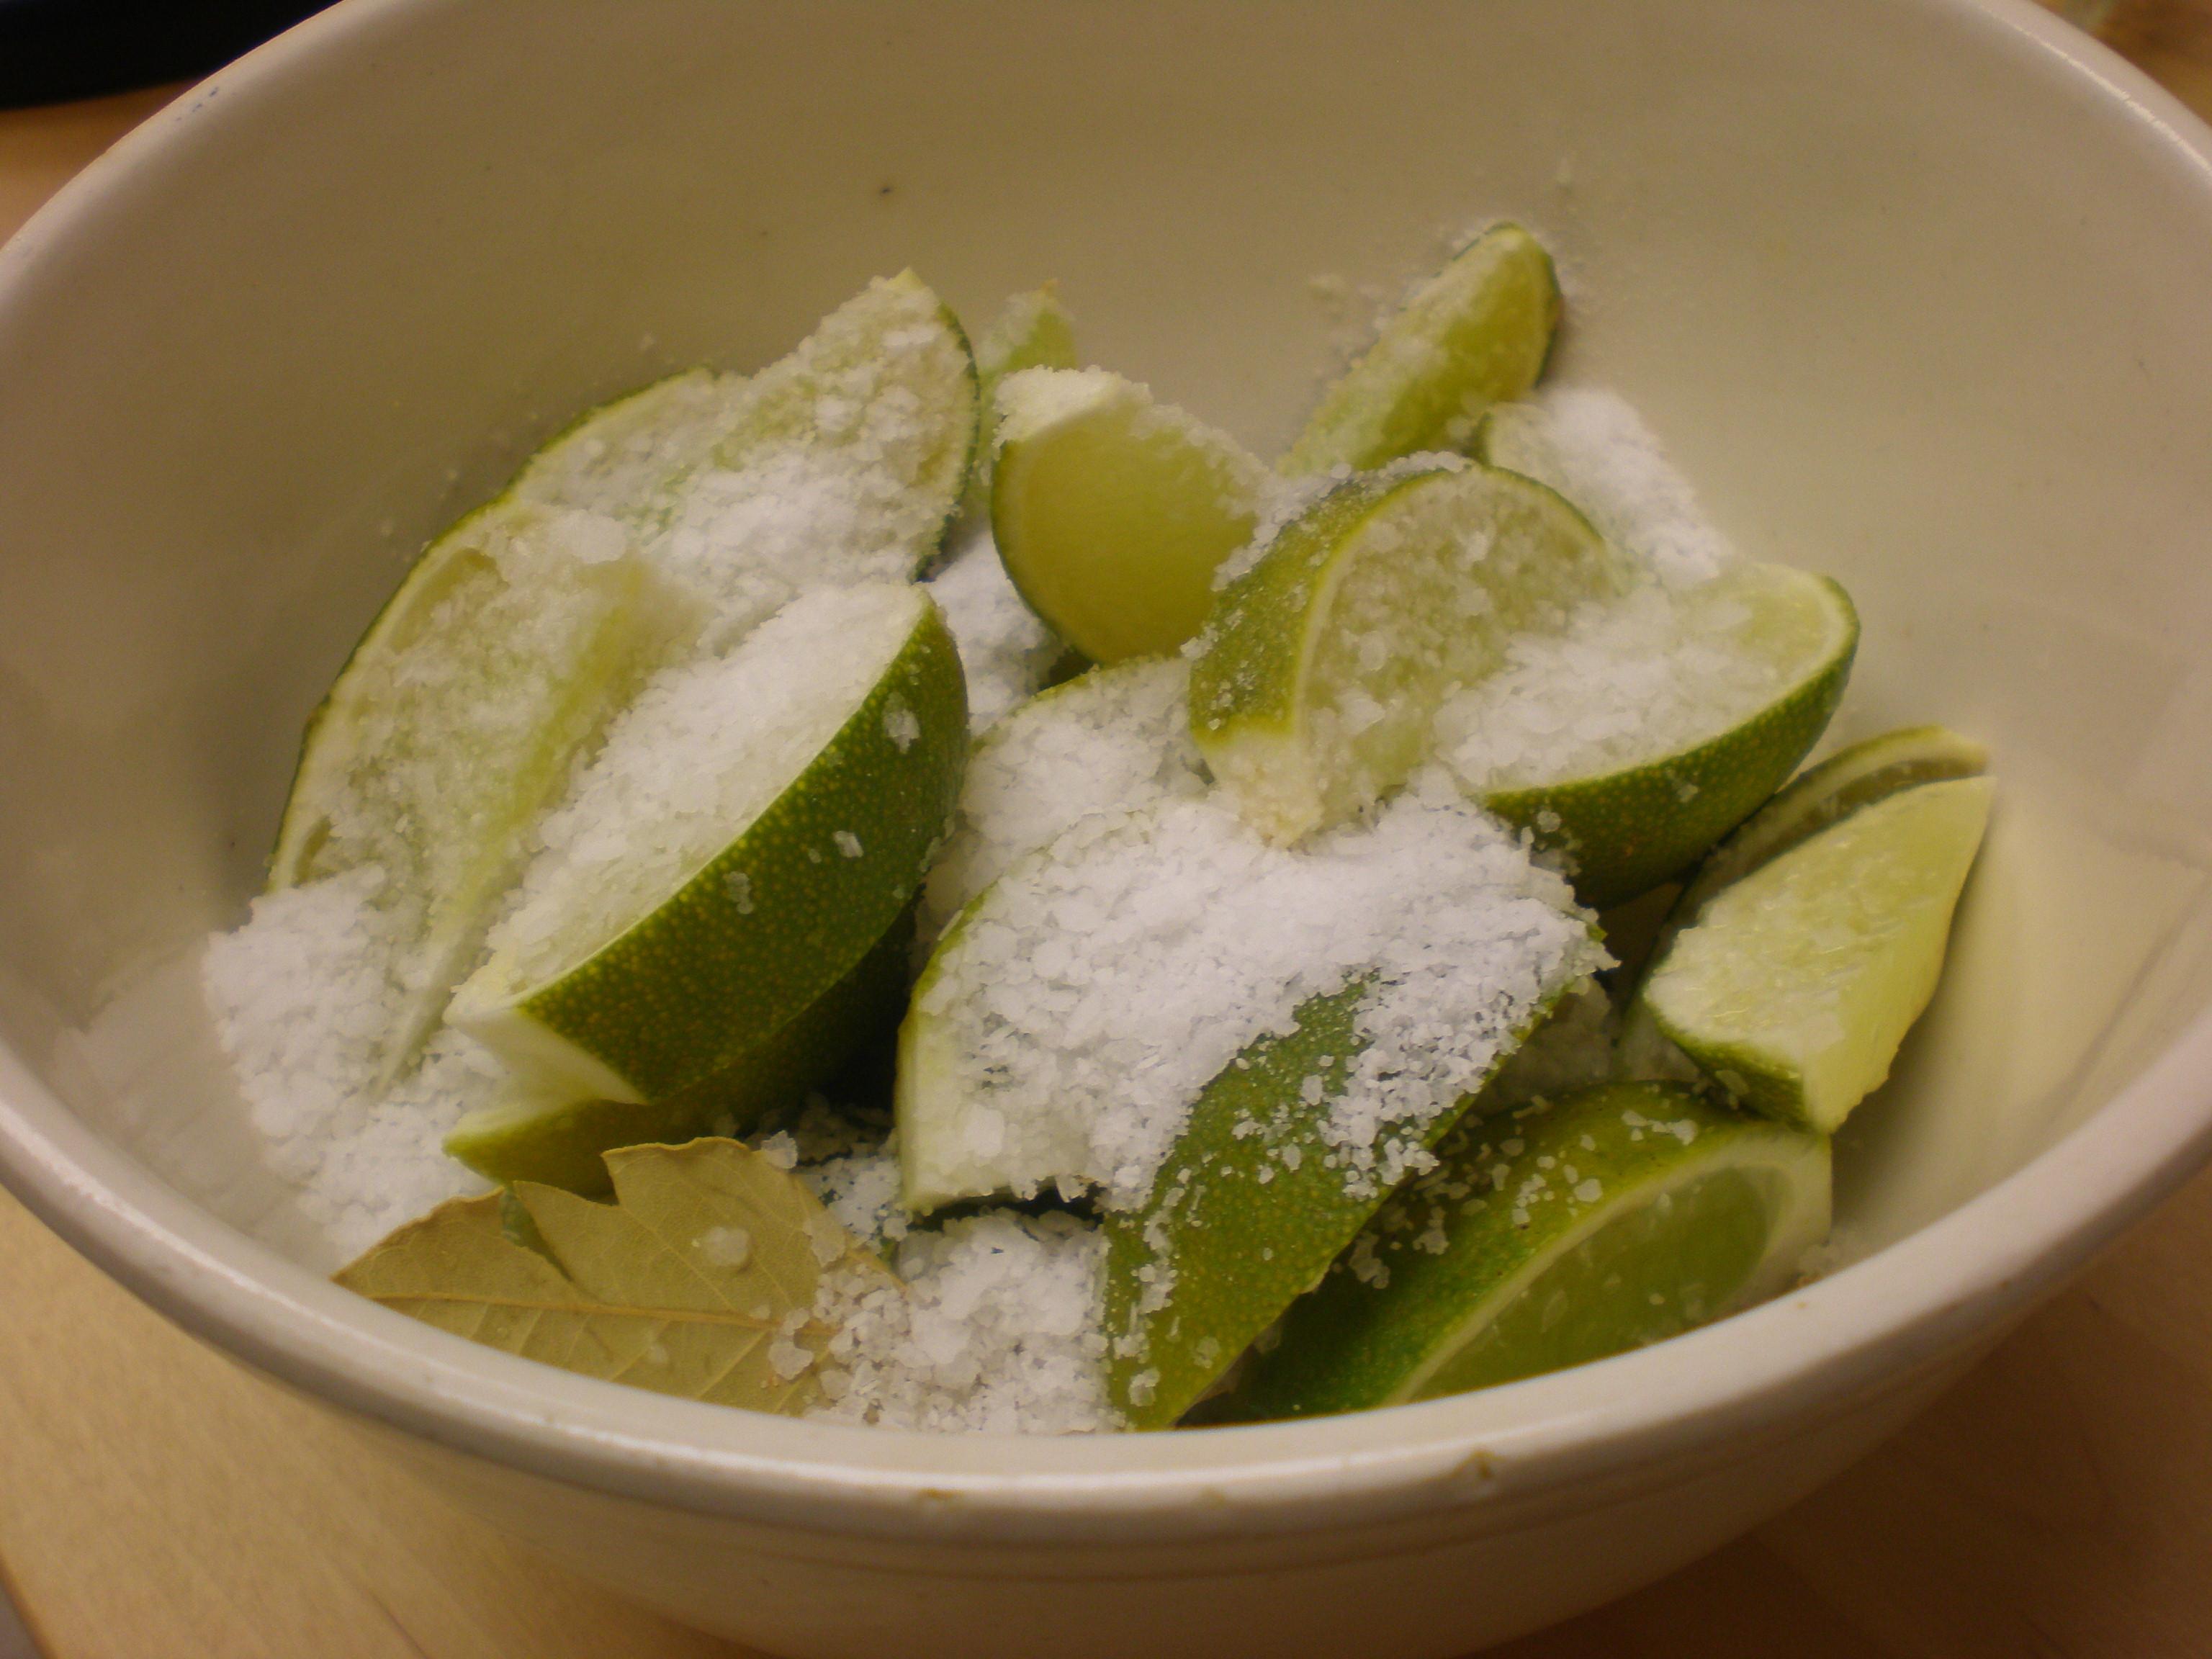 Limes tossed with kosher salt